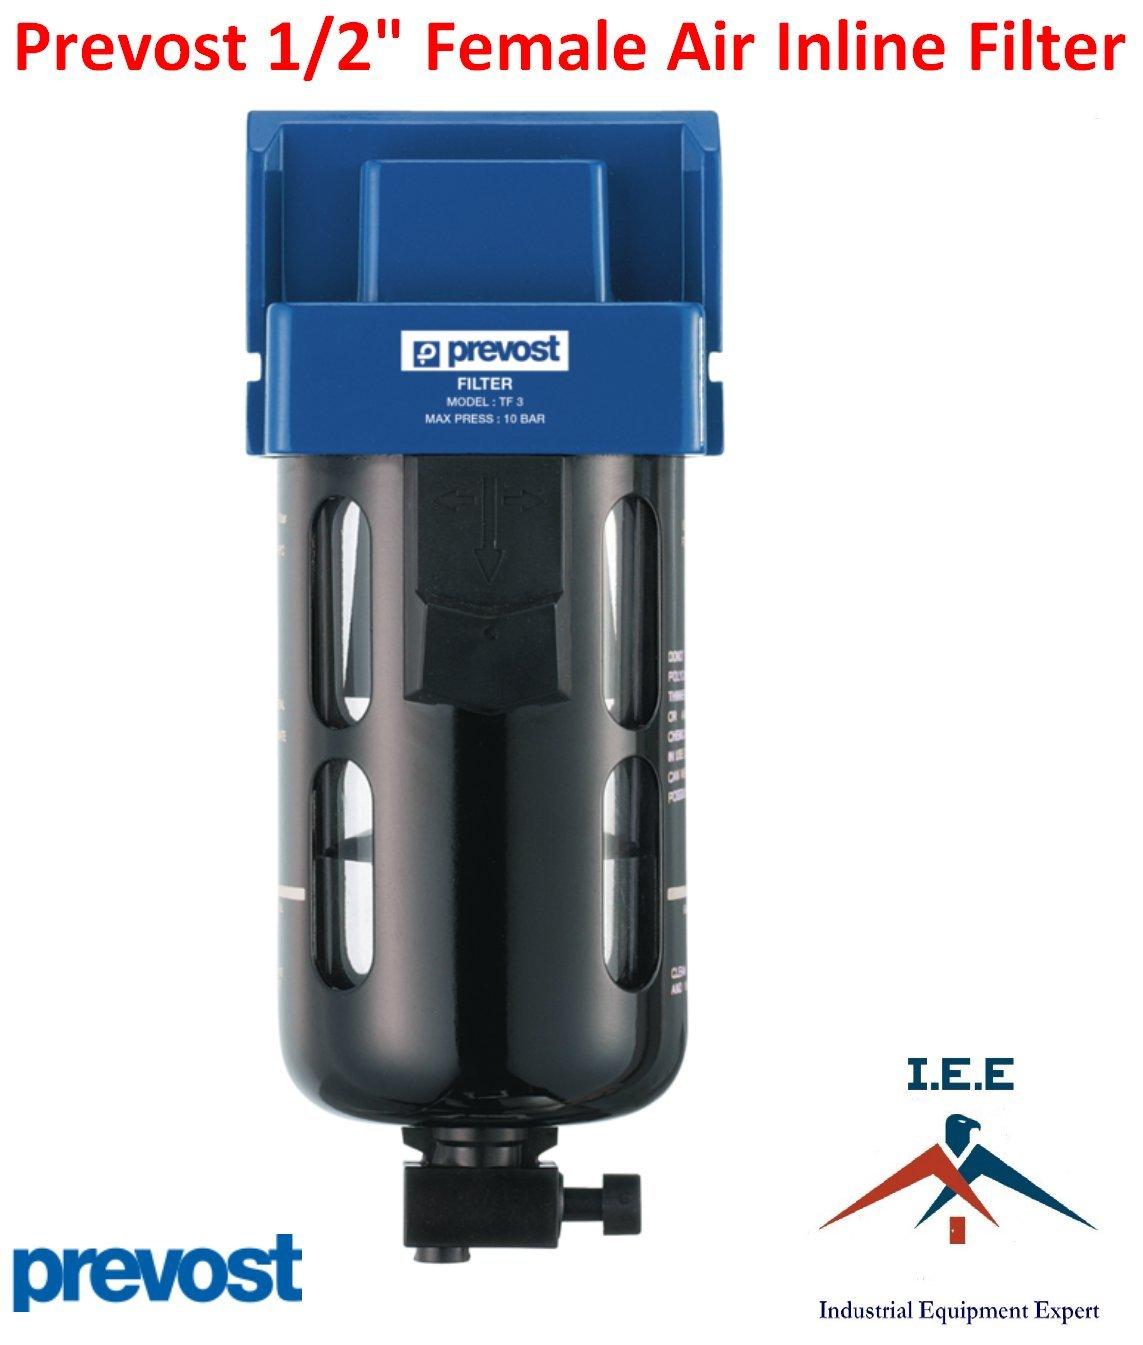 Industrial Equipment Expert Prevost Compressed Air Inline Moisture Trap Water Separator Filter 1/2 FNPT New by Prevost